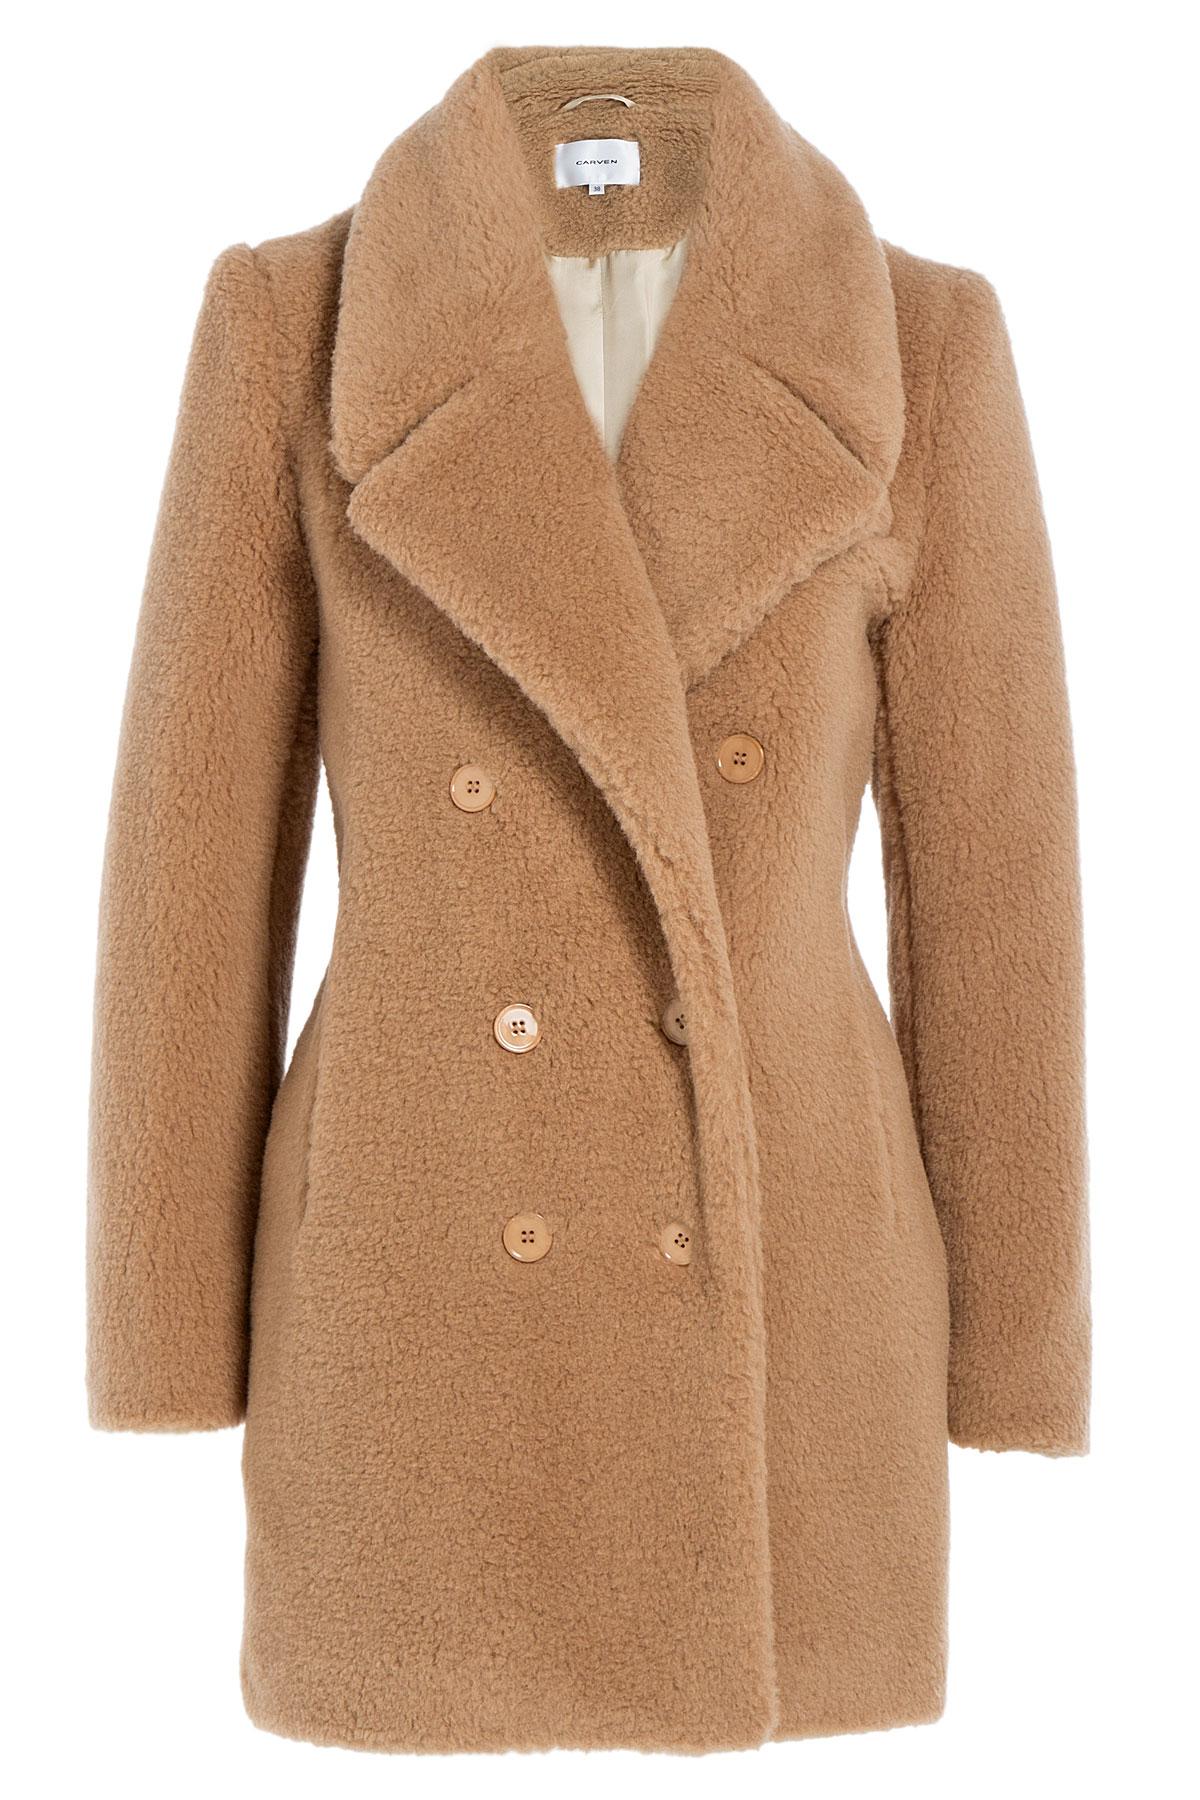 Alpaca Fur Coats Tradingbasis